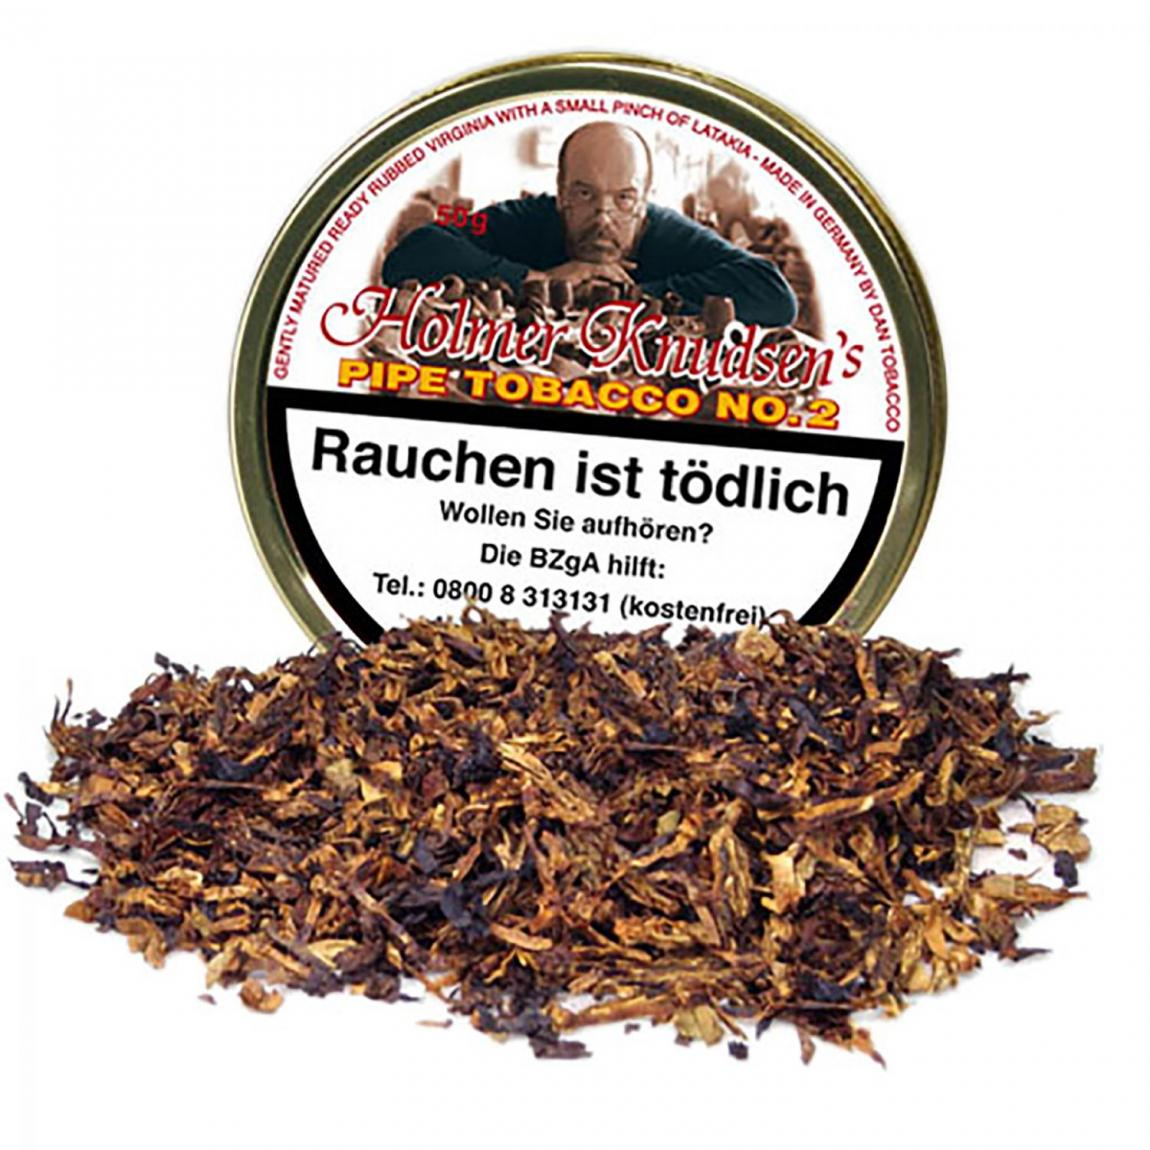 Holmer Knudsen's Pipe Tobacco No.2 250g Sparpack